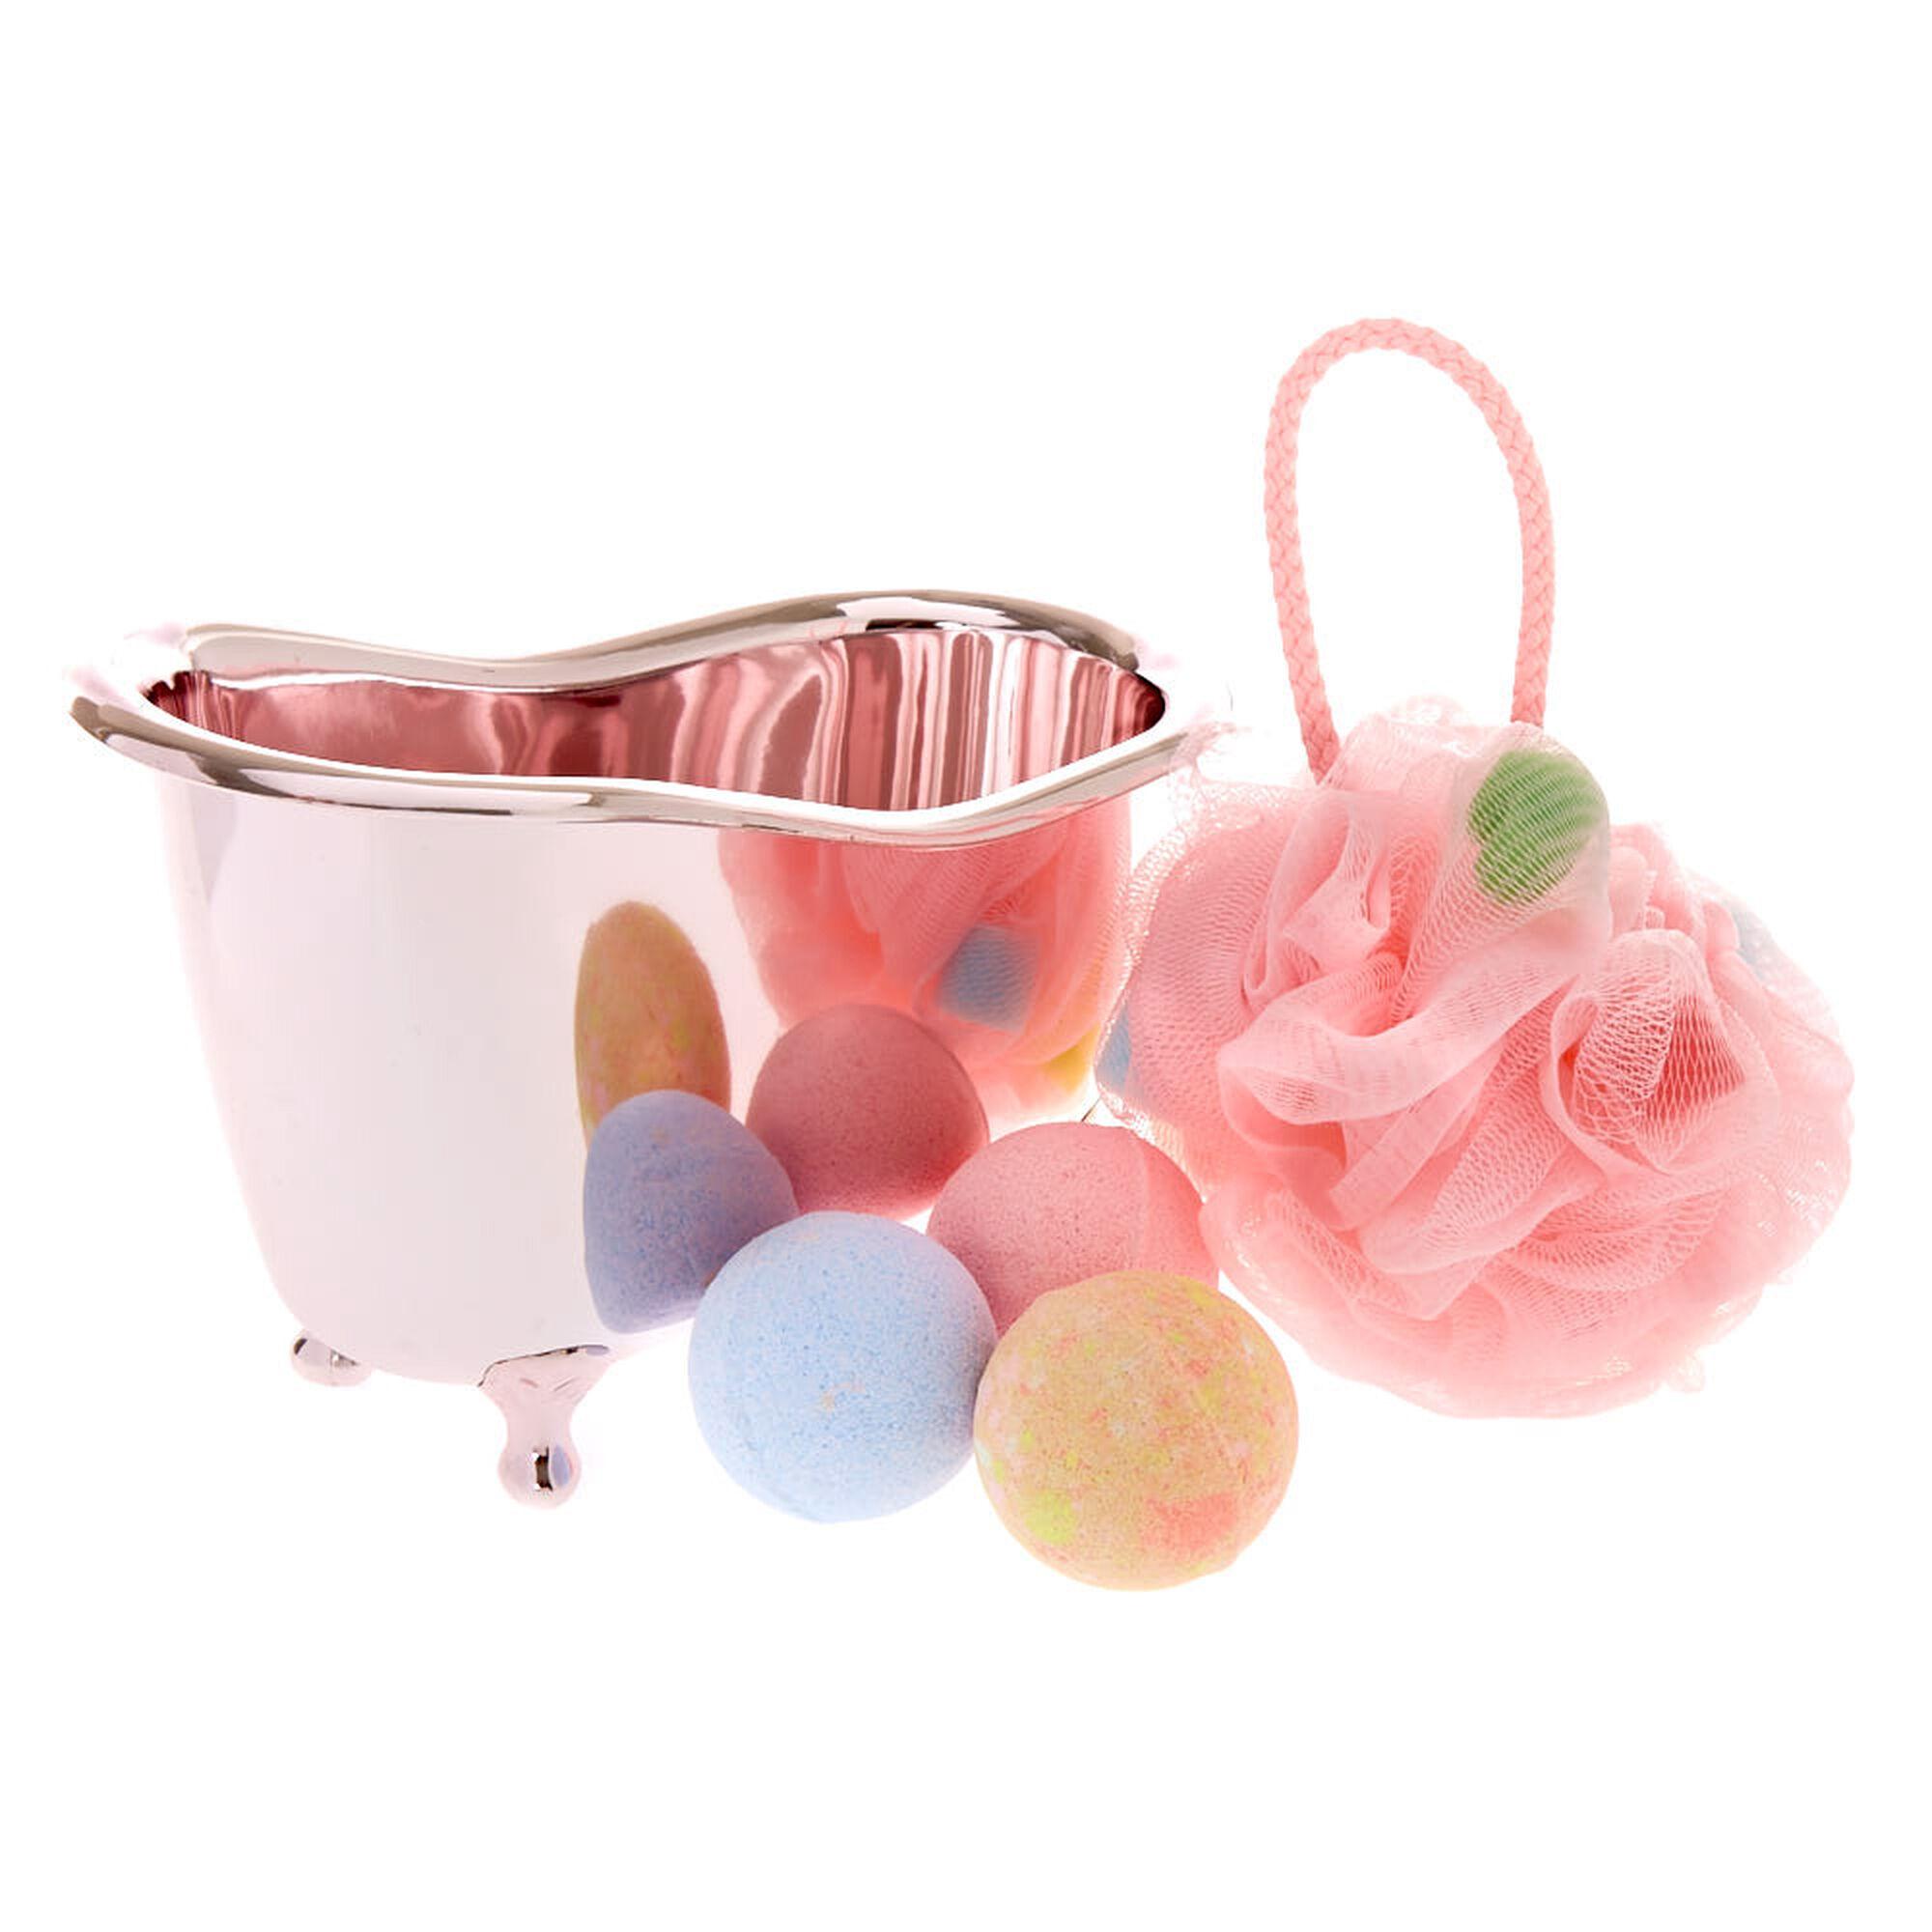 Rose gold tub bath set claire 39 s us for Rose gold bathroom set